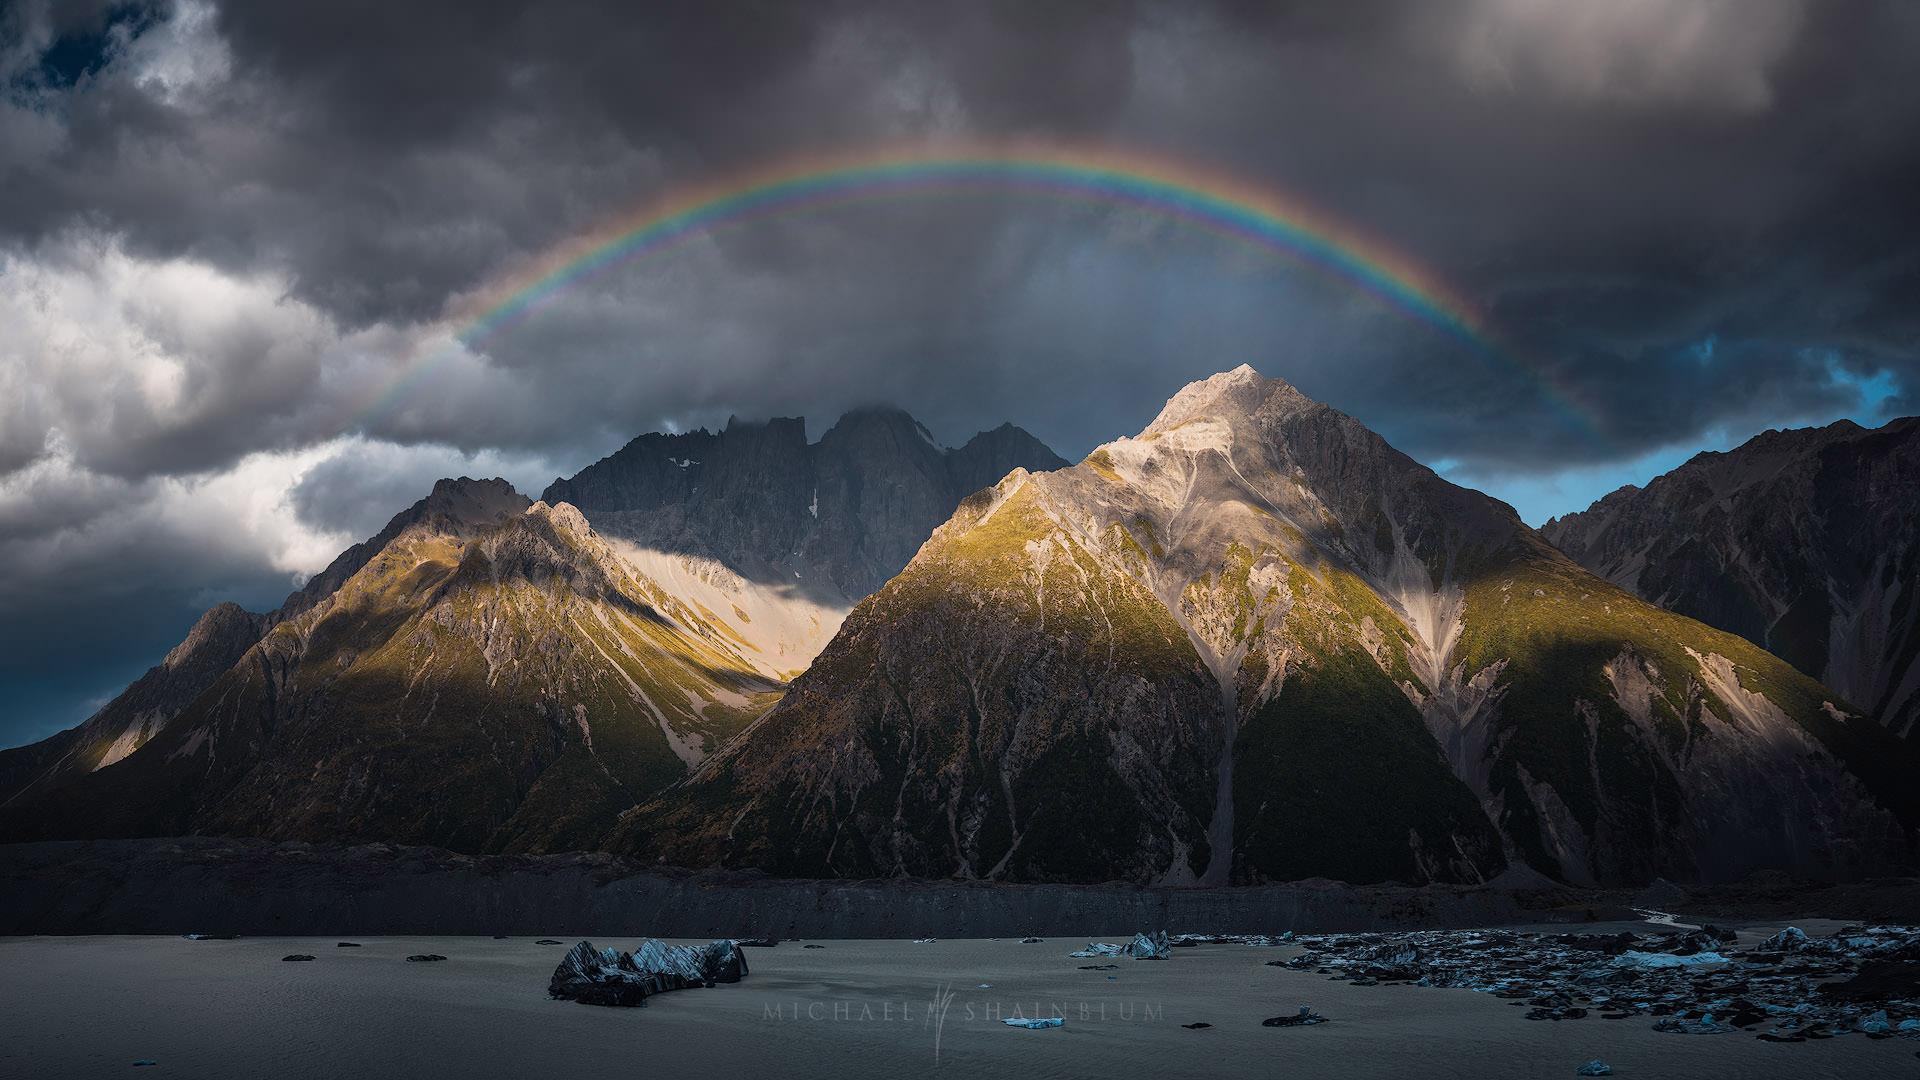 Rainbow Mount Cook, New Zealand Landscape Photography